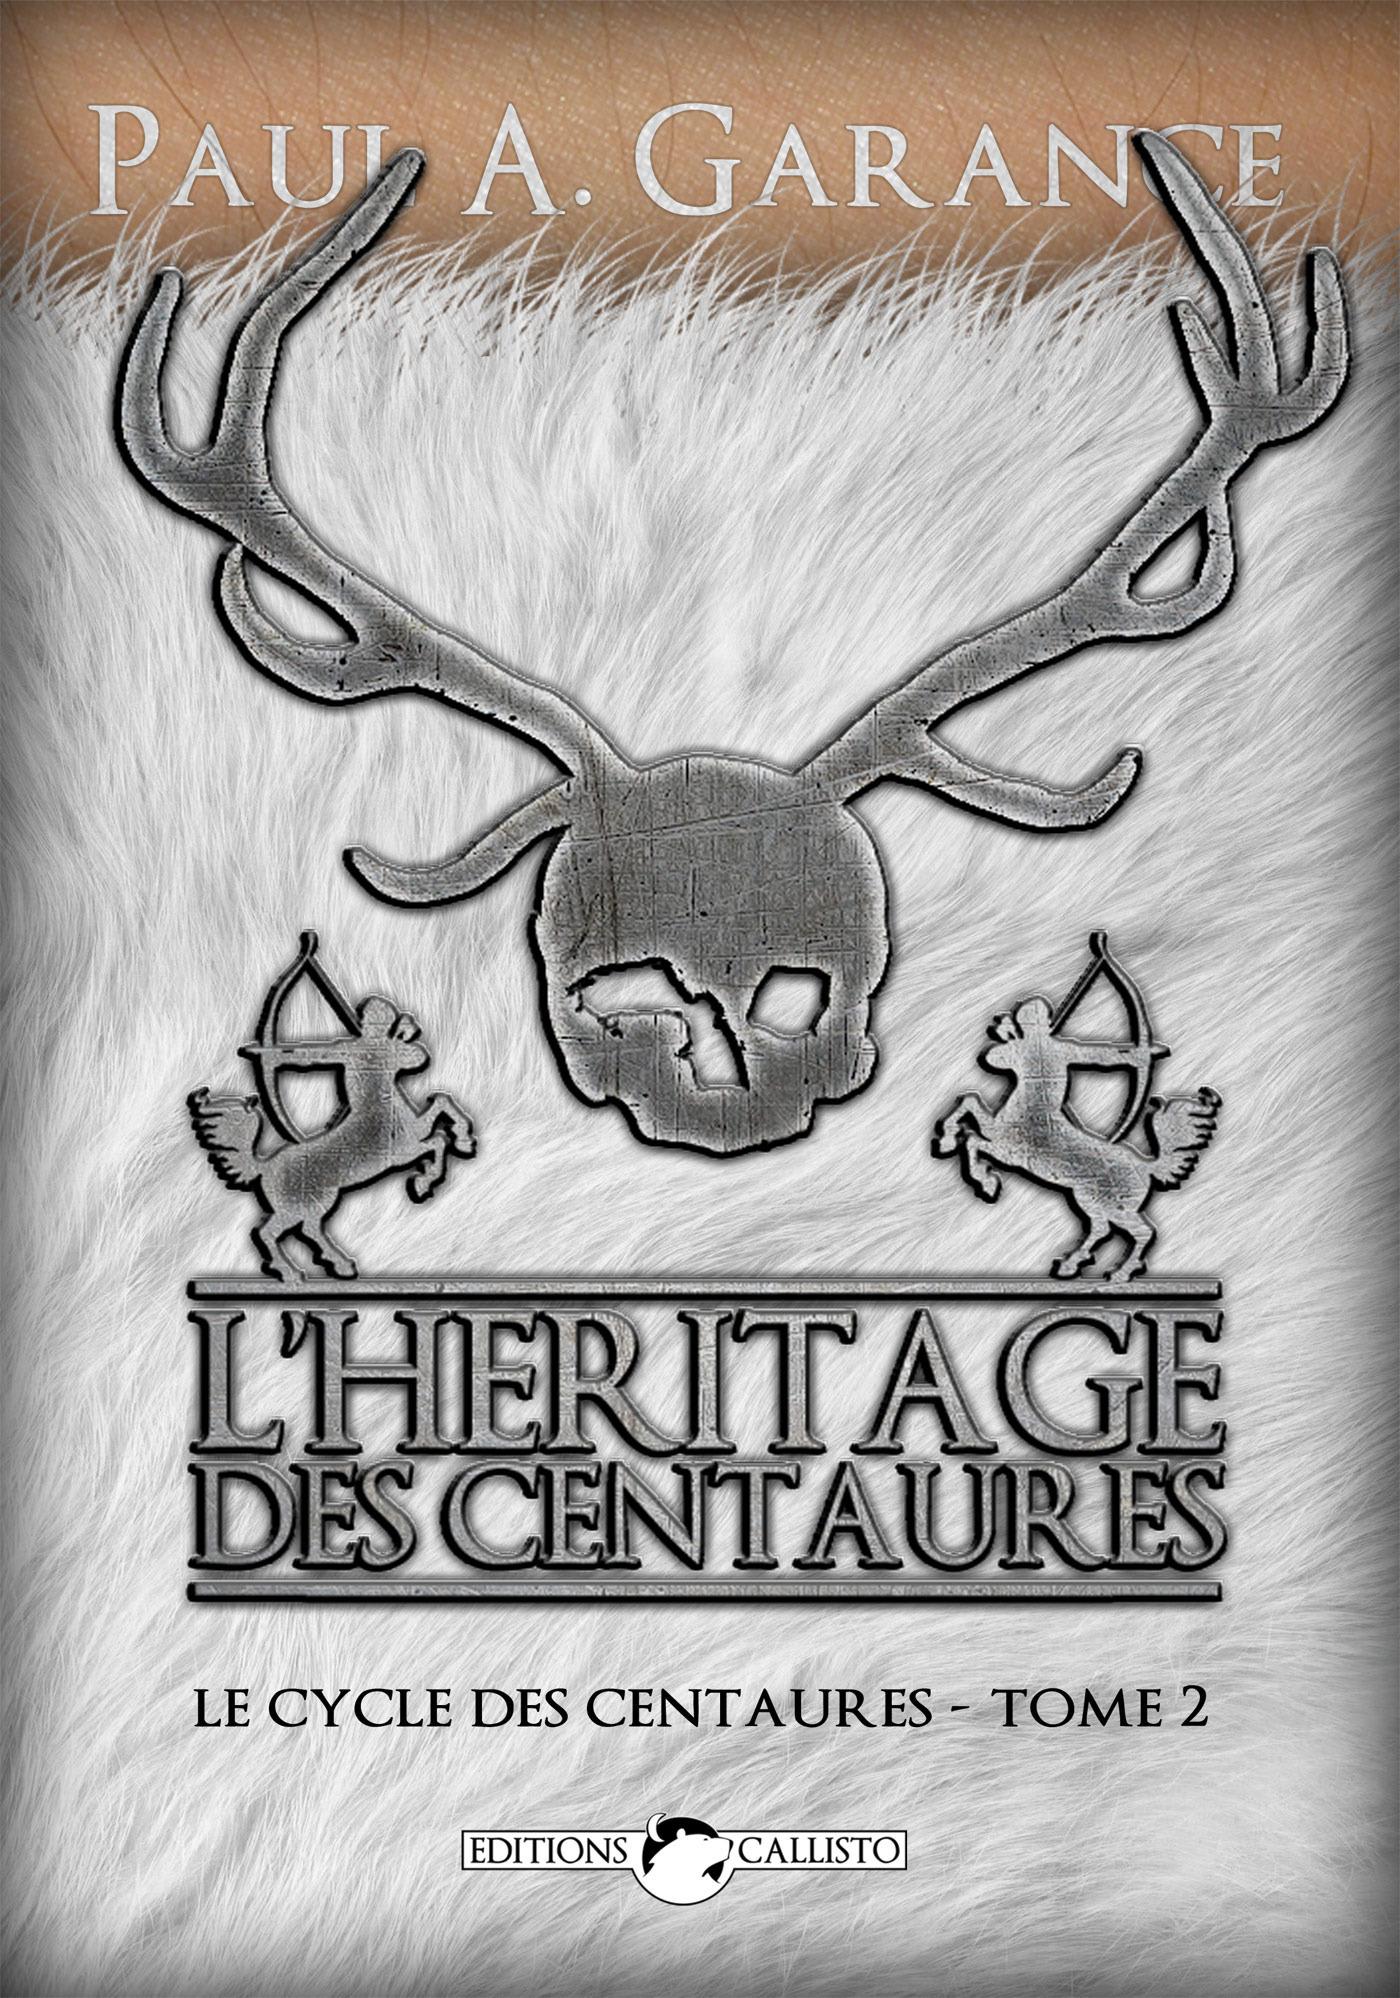 L'heritage des centaures